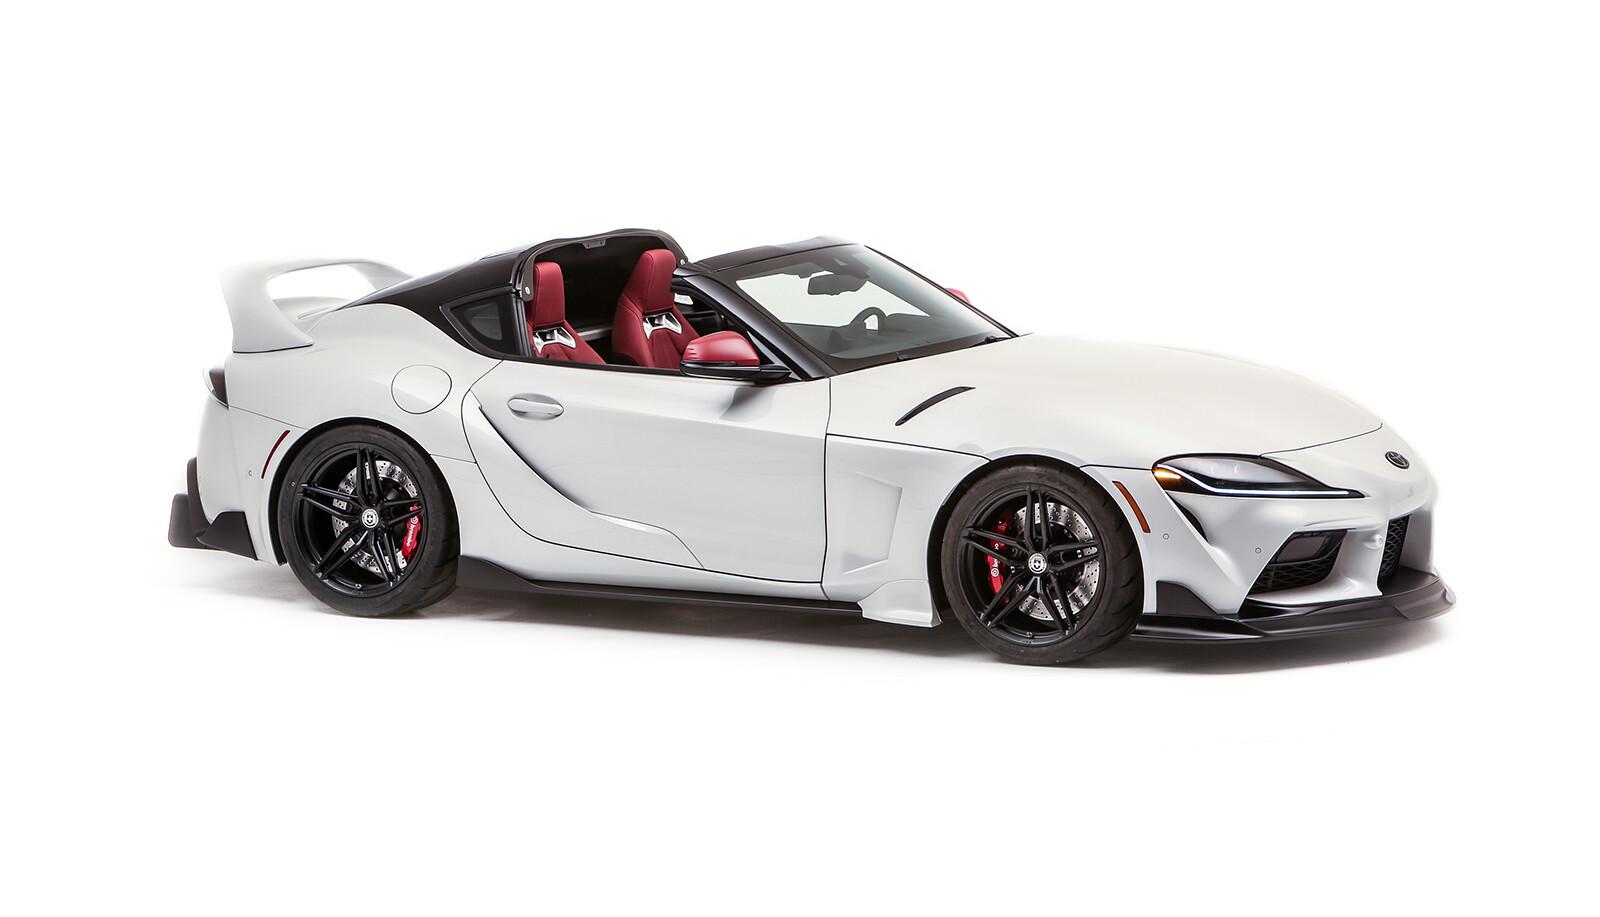 Foto de Toyota GR Supra Sport Top 2021 concept (1/10)